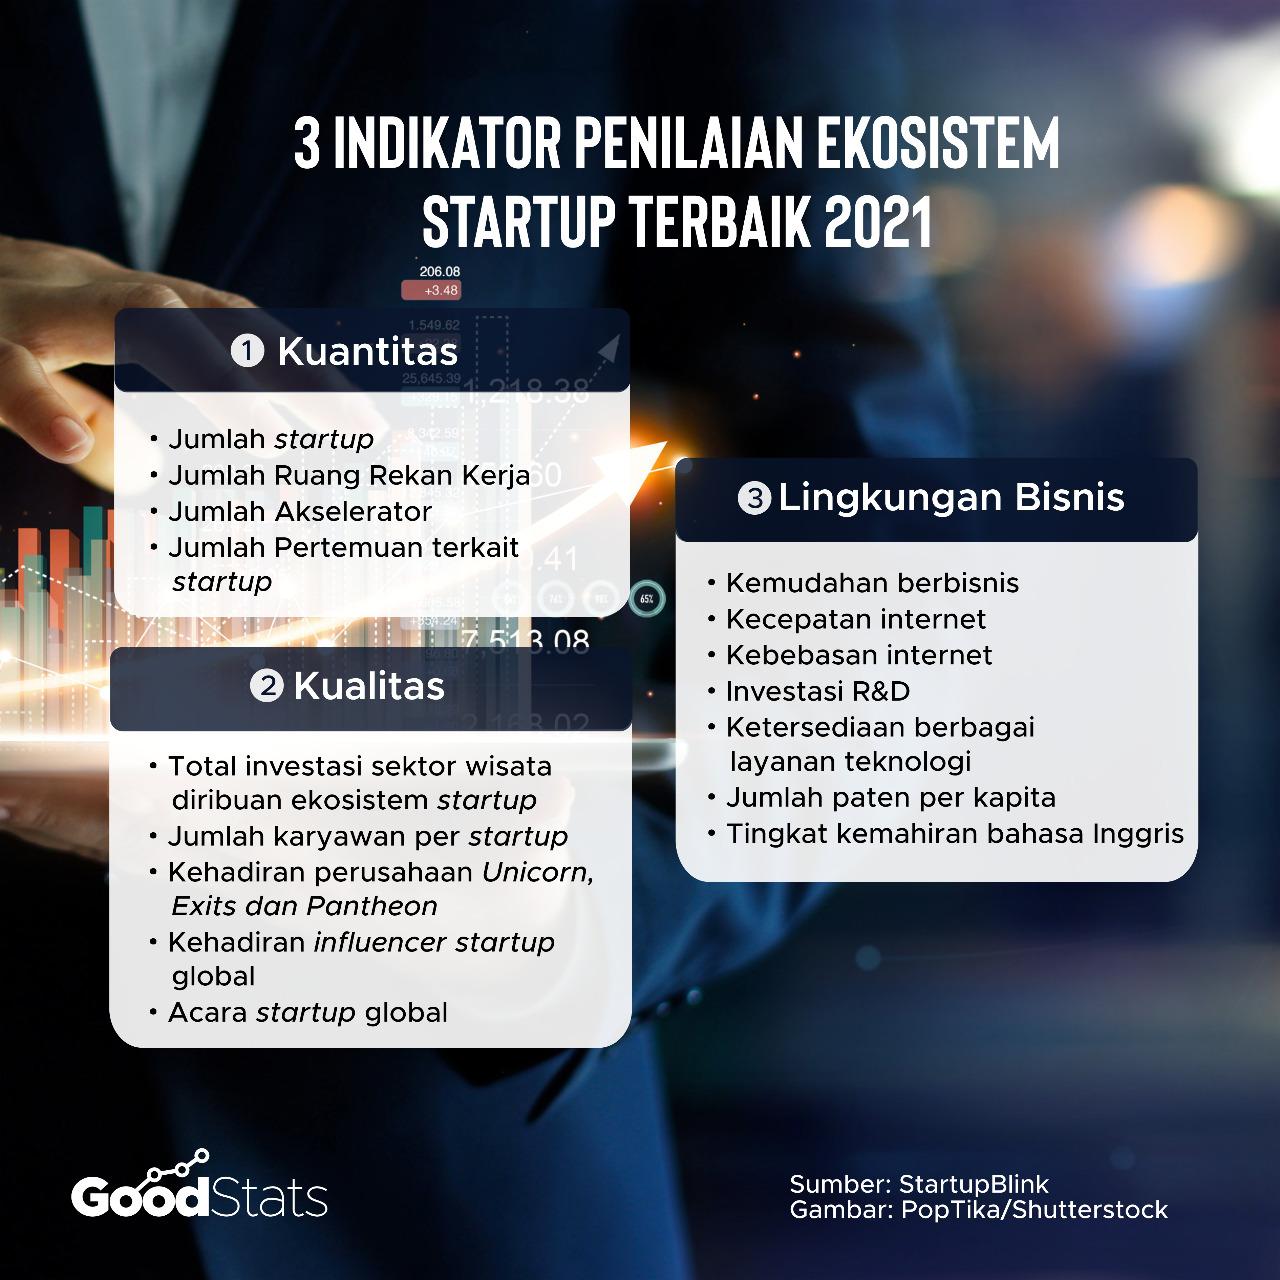 Indikator penilaian dalam laporan The Global Startup Ecosystem Index Report 2021 | GoodStats